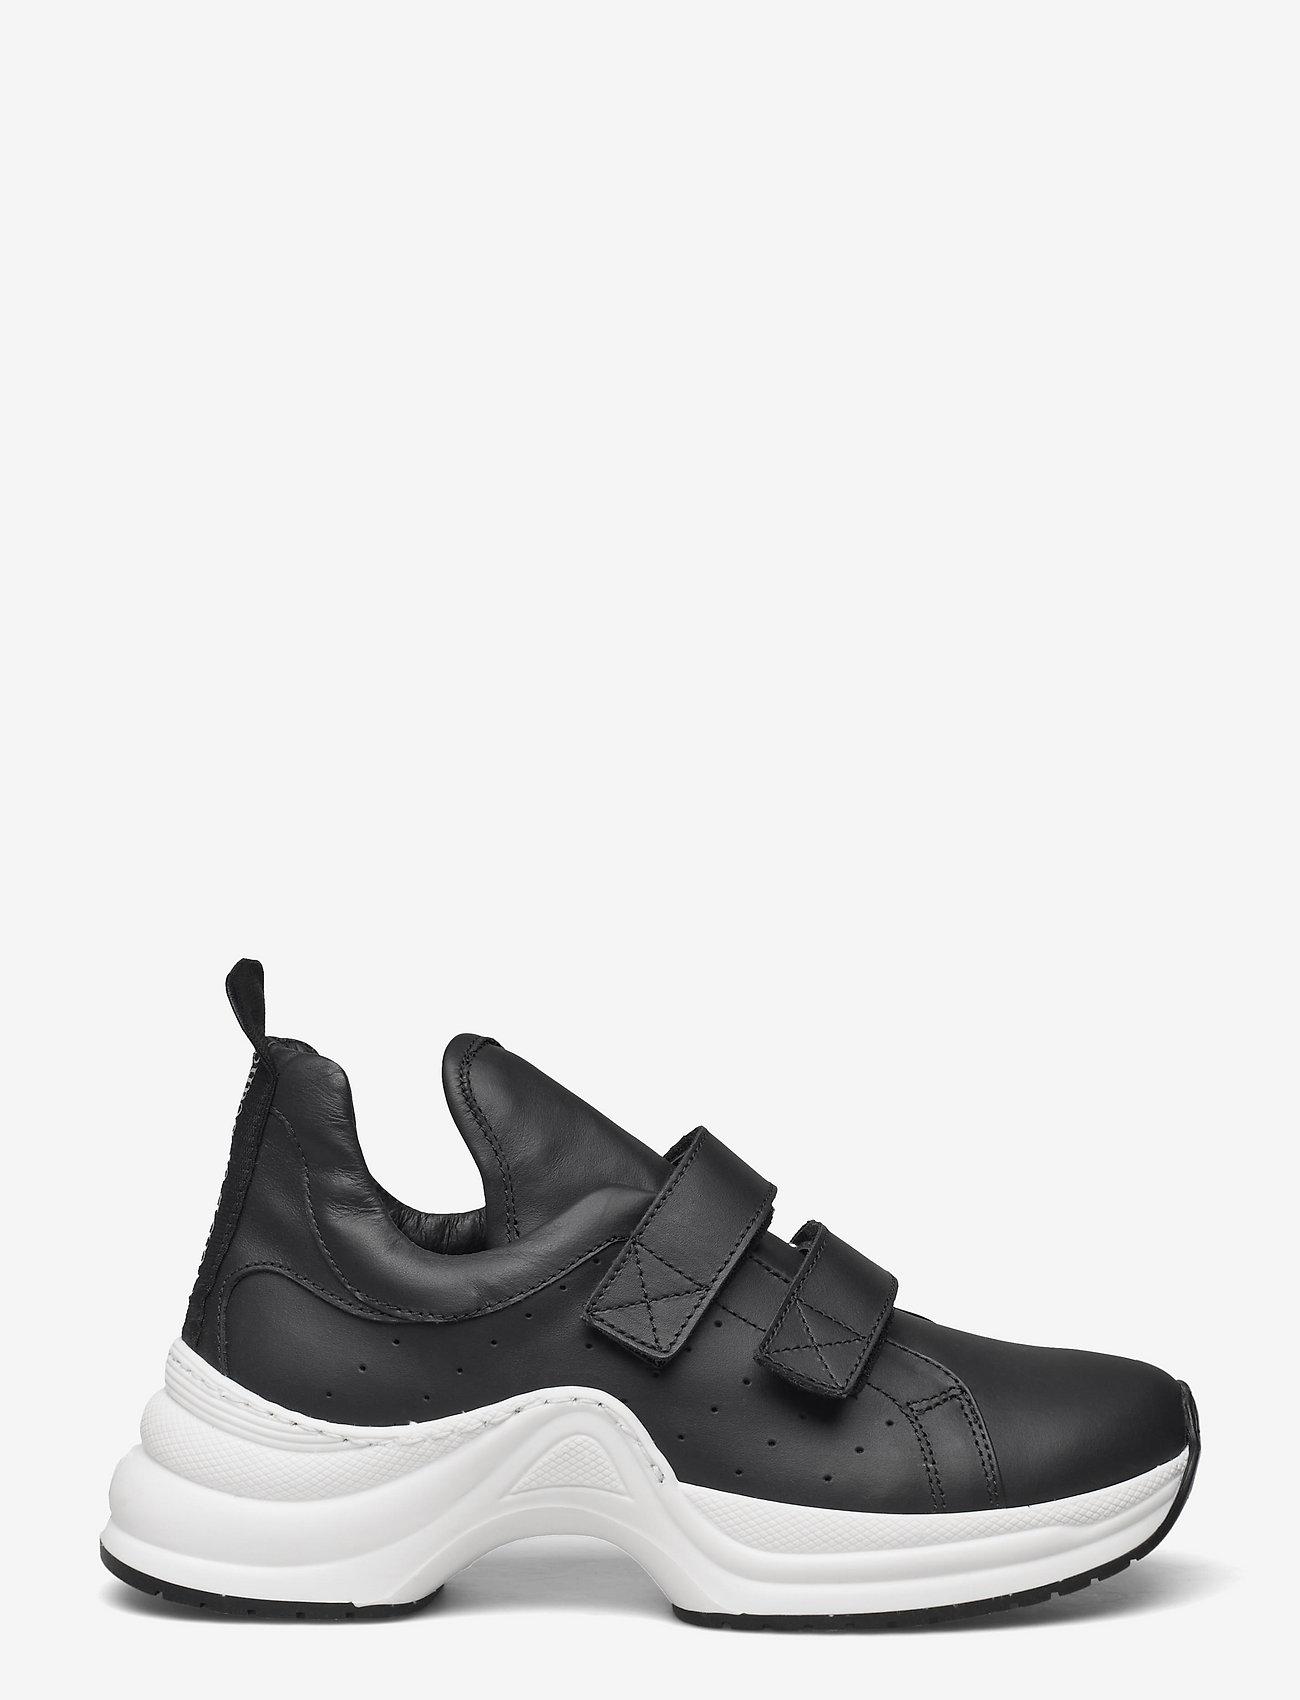 Nude of Scandinavia - JOY - chunky sneakers - premium / nero - 1